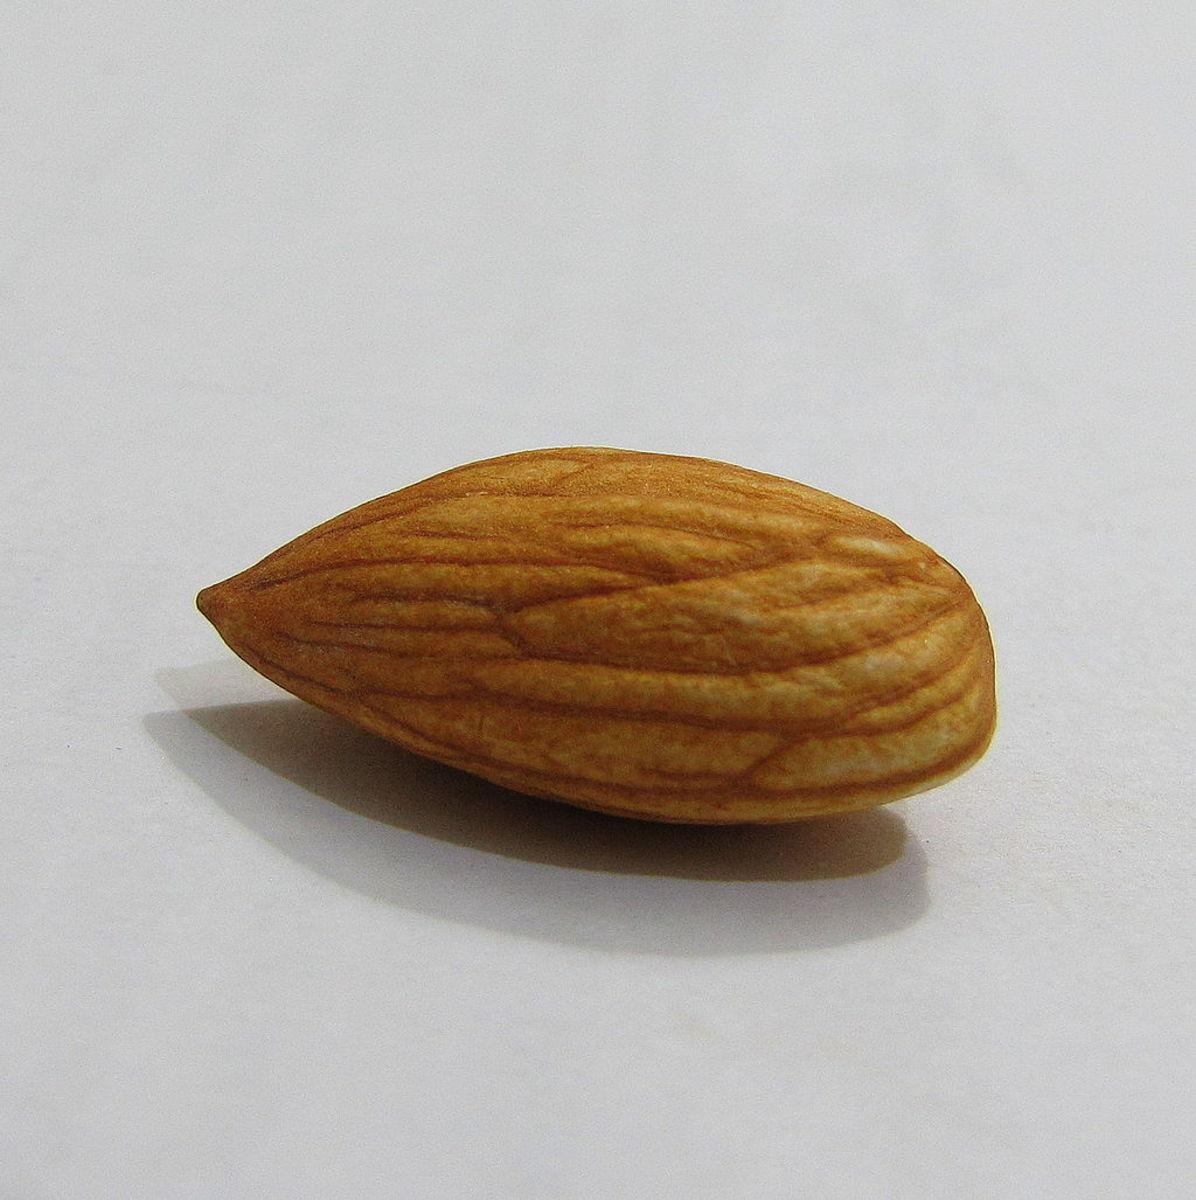 Almond gives skin lightening effect